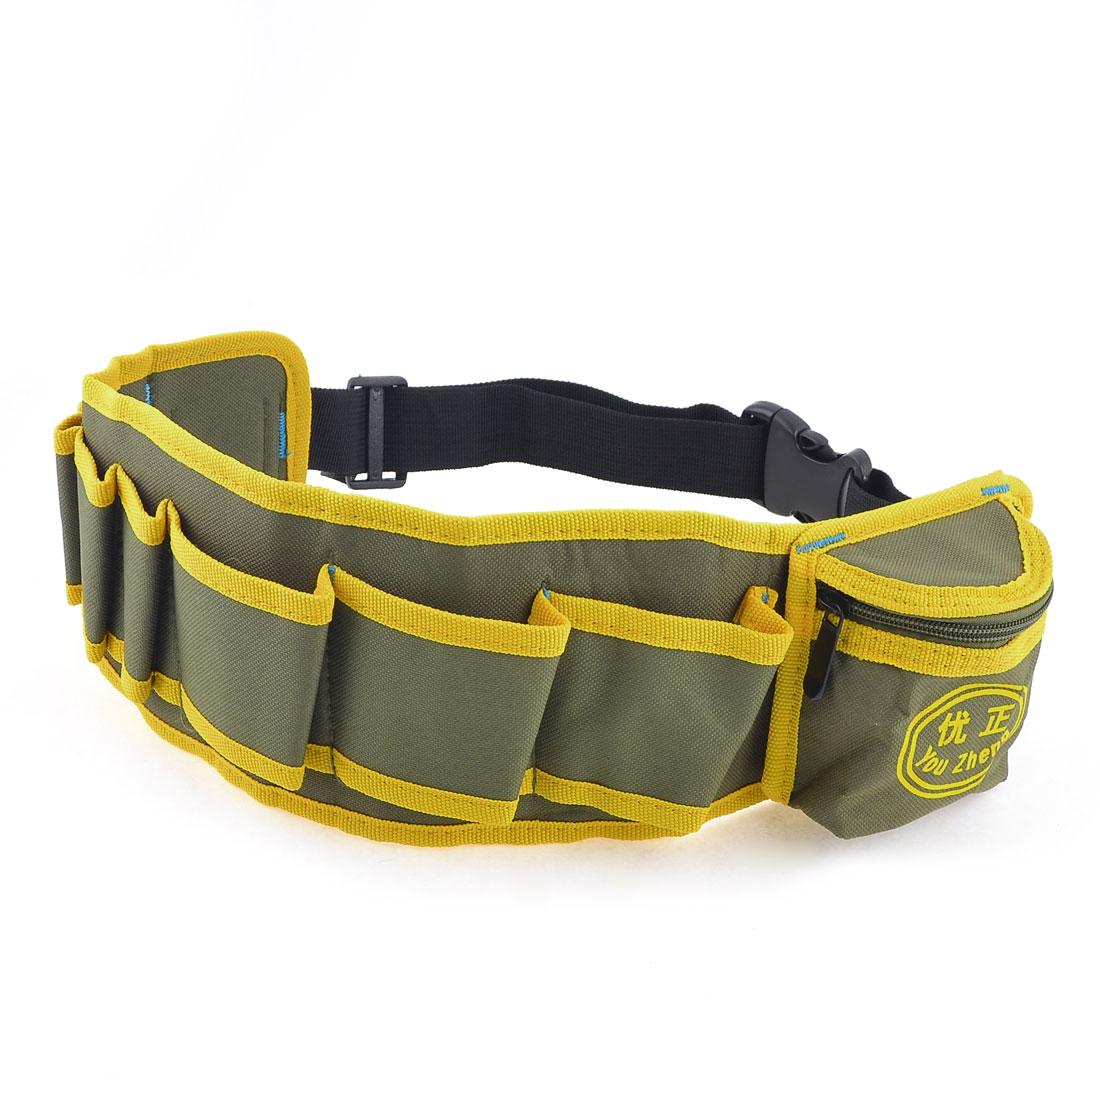 Green Yellow Release Buckle Nylon Pockets Adjustable Work Waist Belt